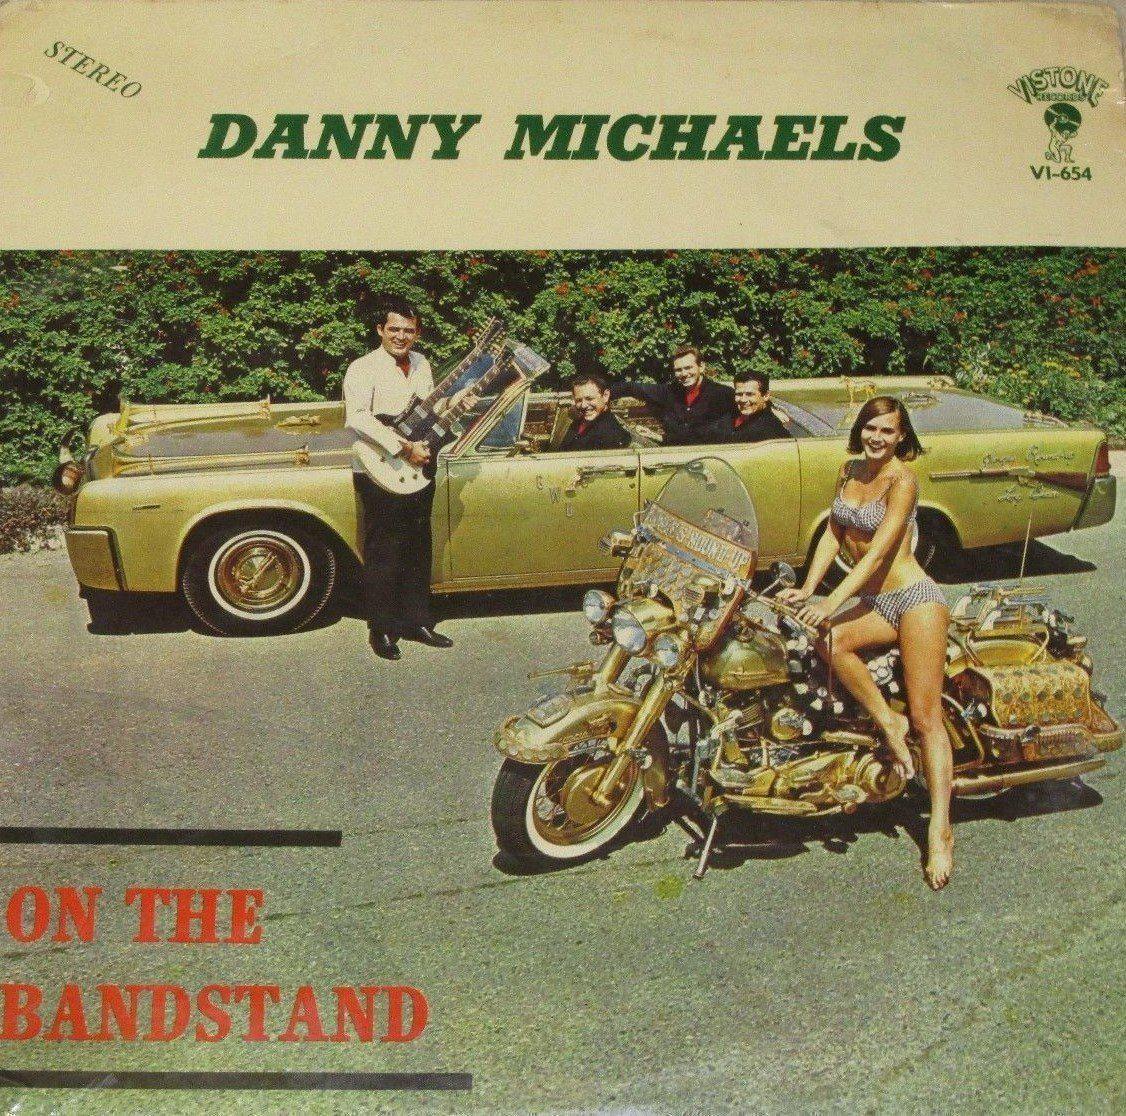 Danny Michaels